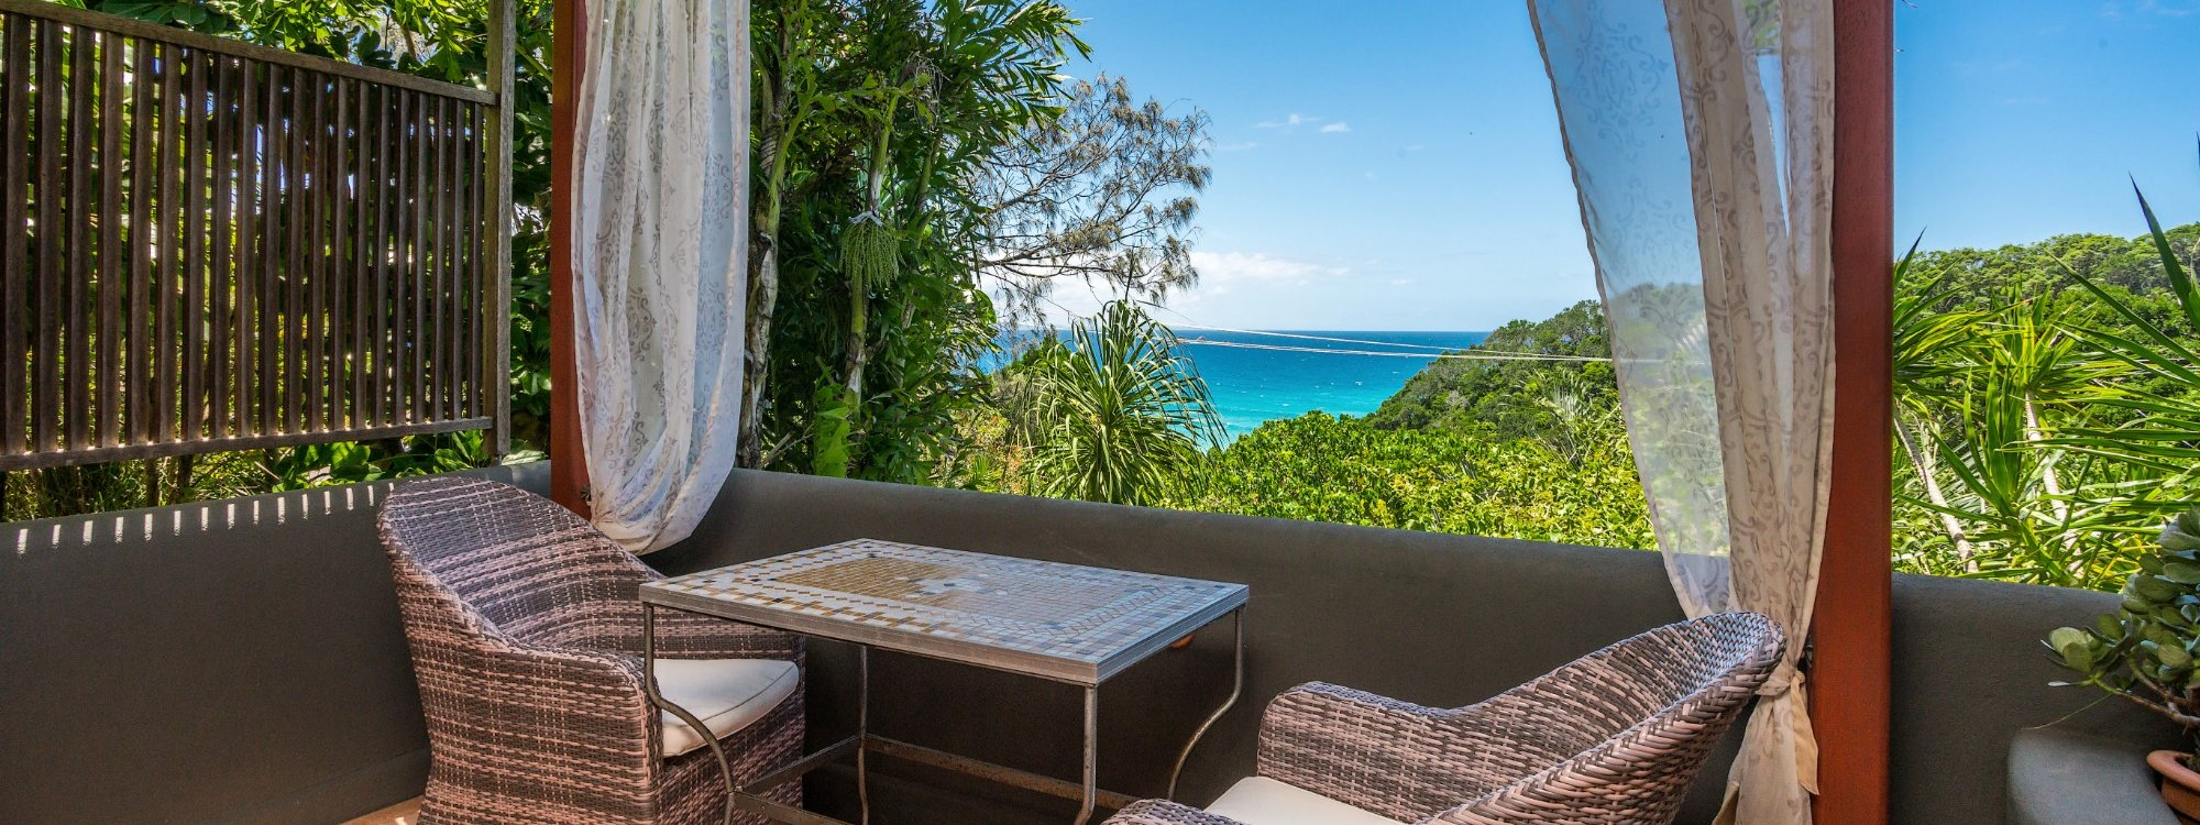 Wategos Retreats - Wategos Beach - Byron Bay - Studio balcony and ocean views